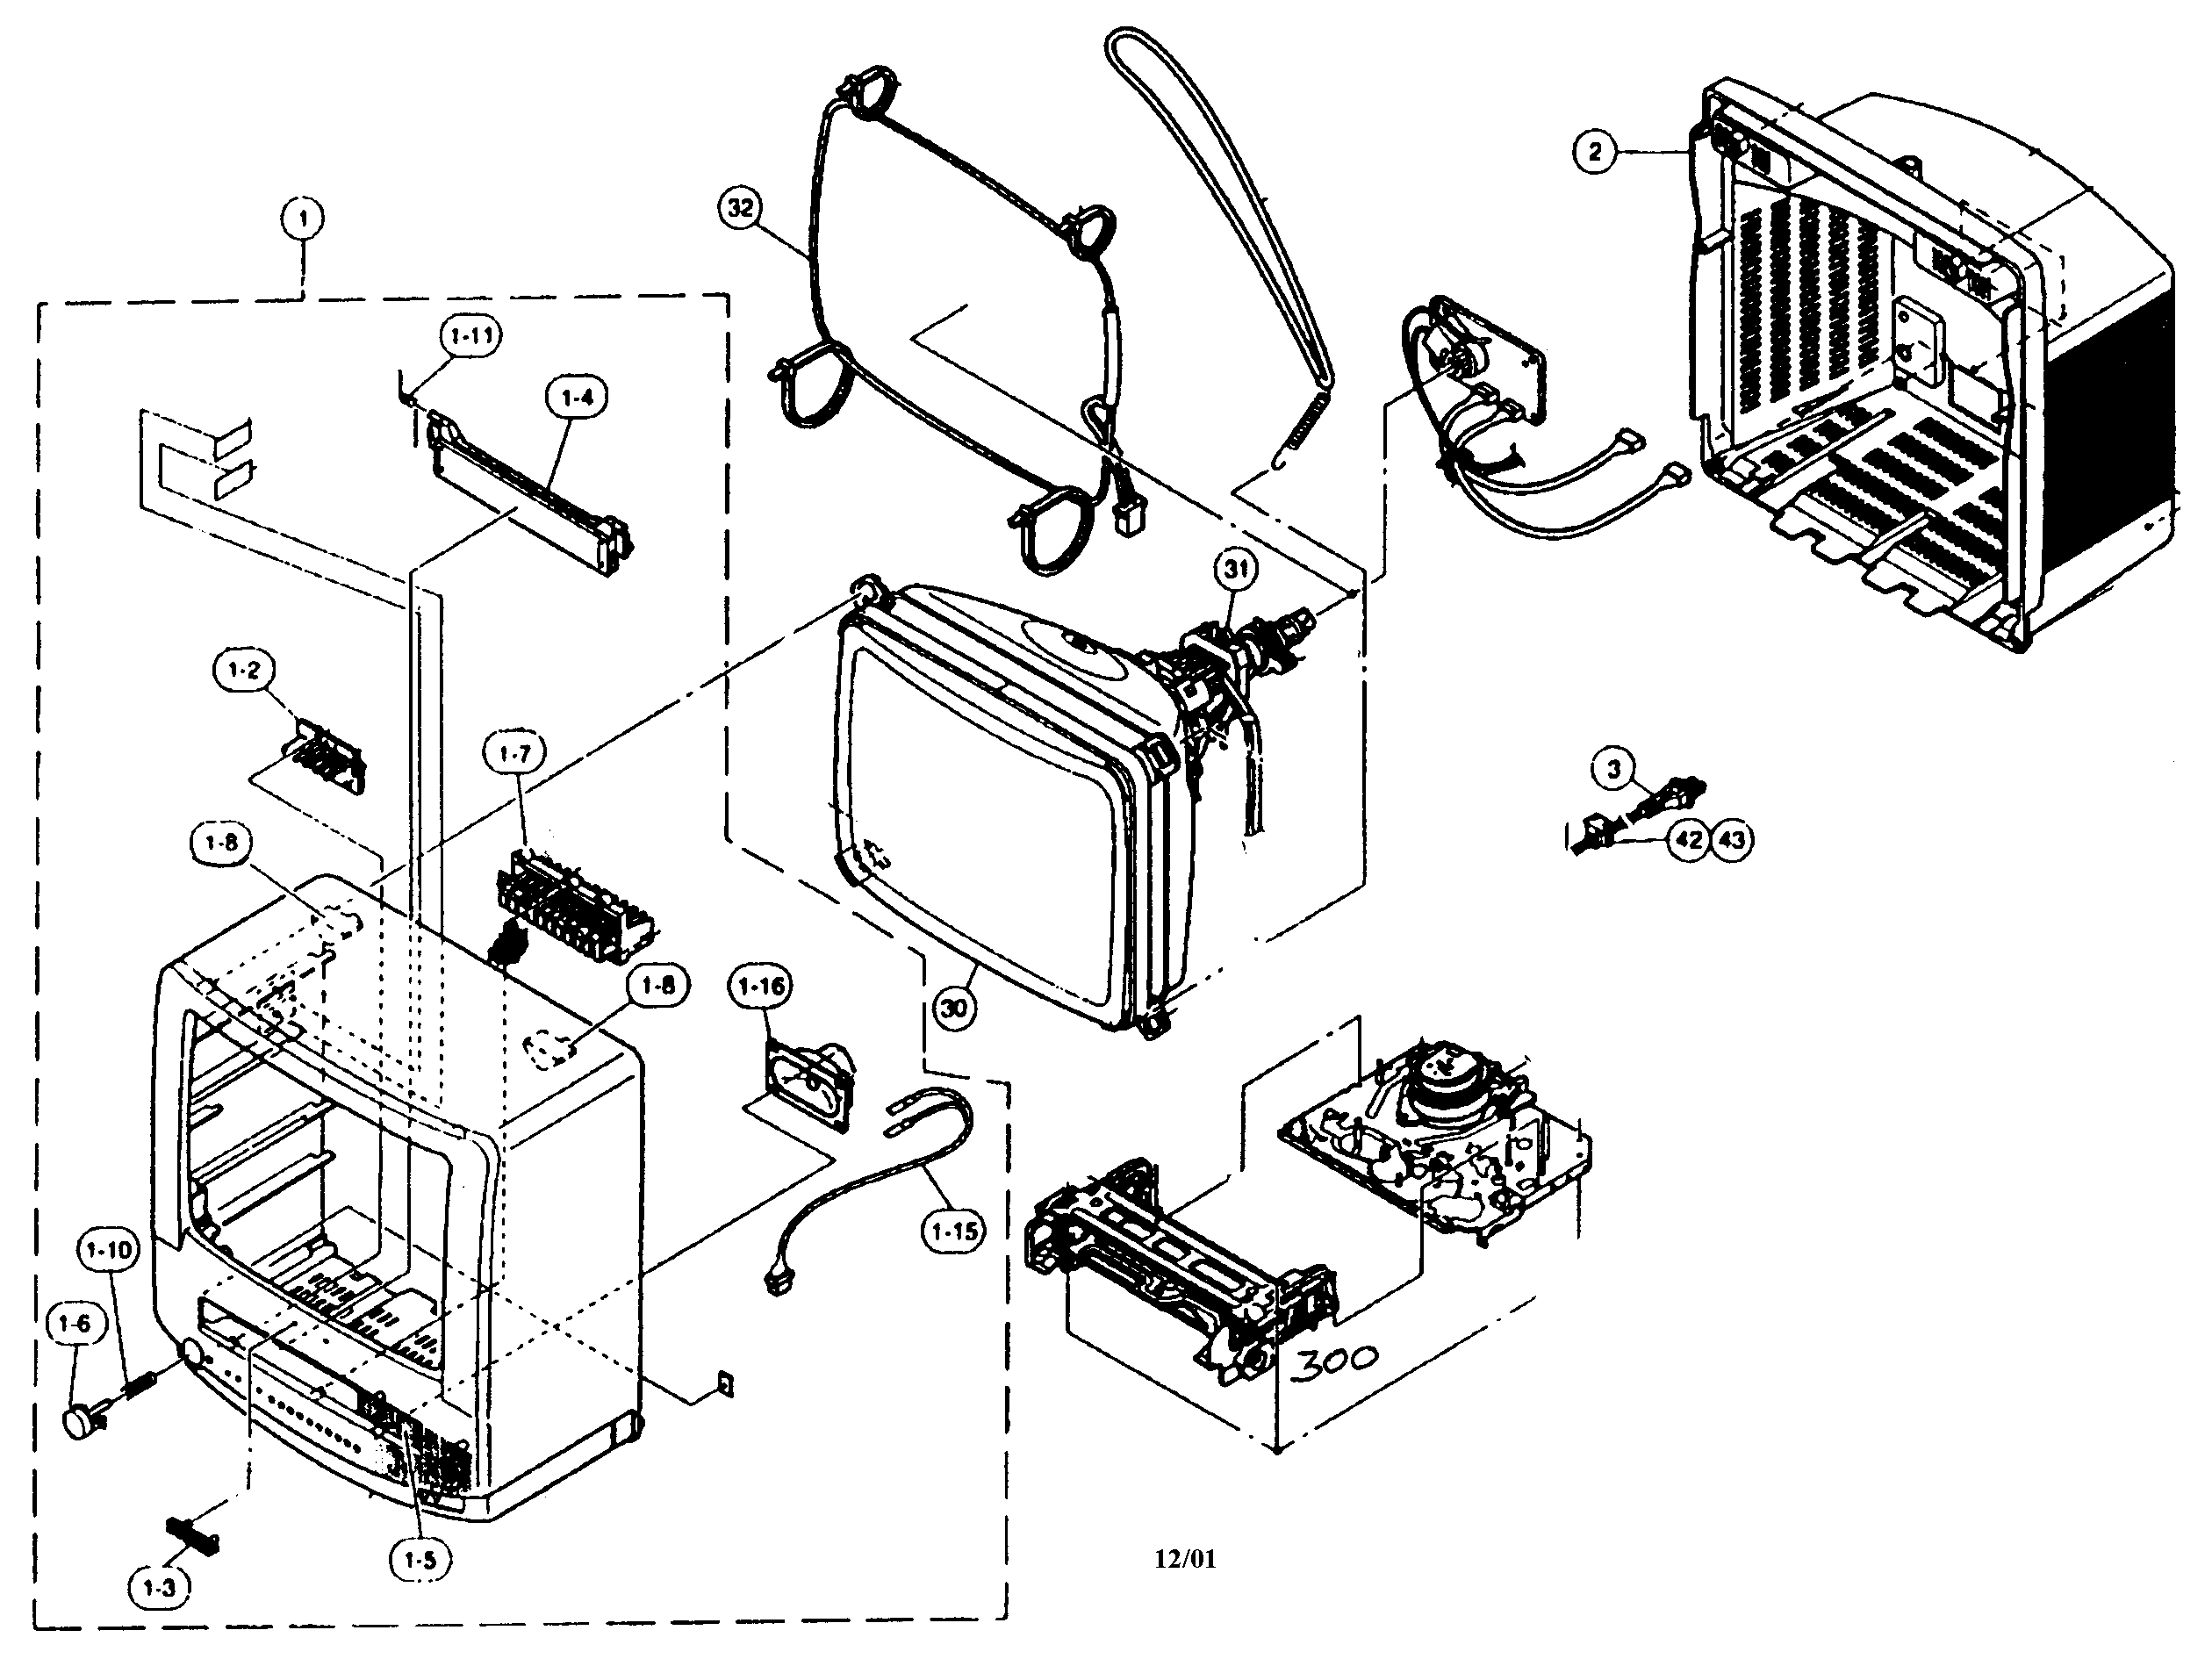 CABINET PARTS Diagram & Parts List for Model 13vtr100